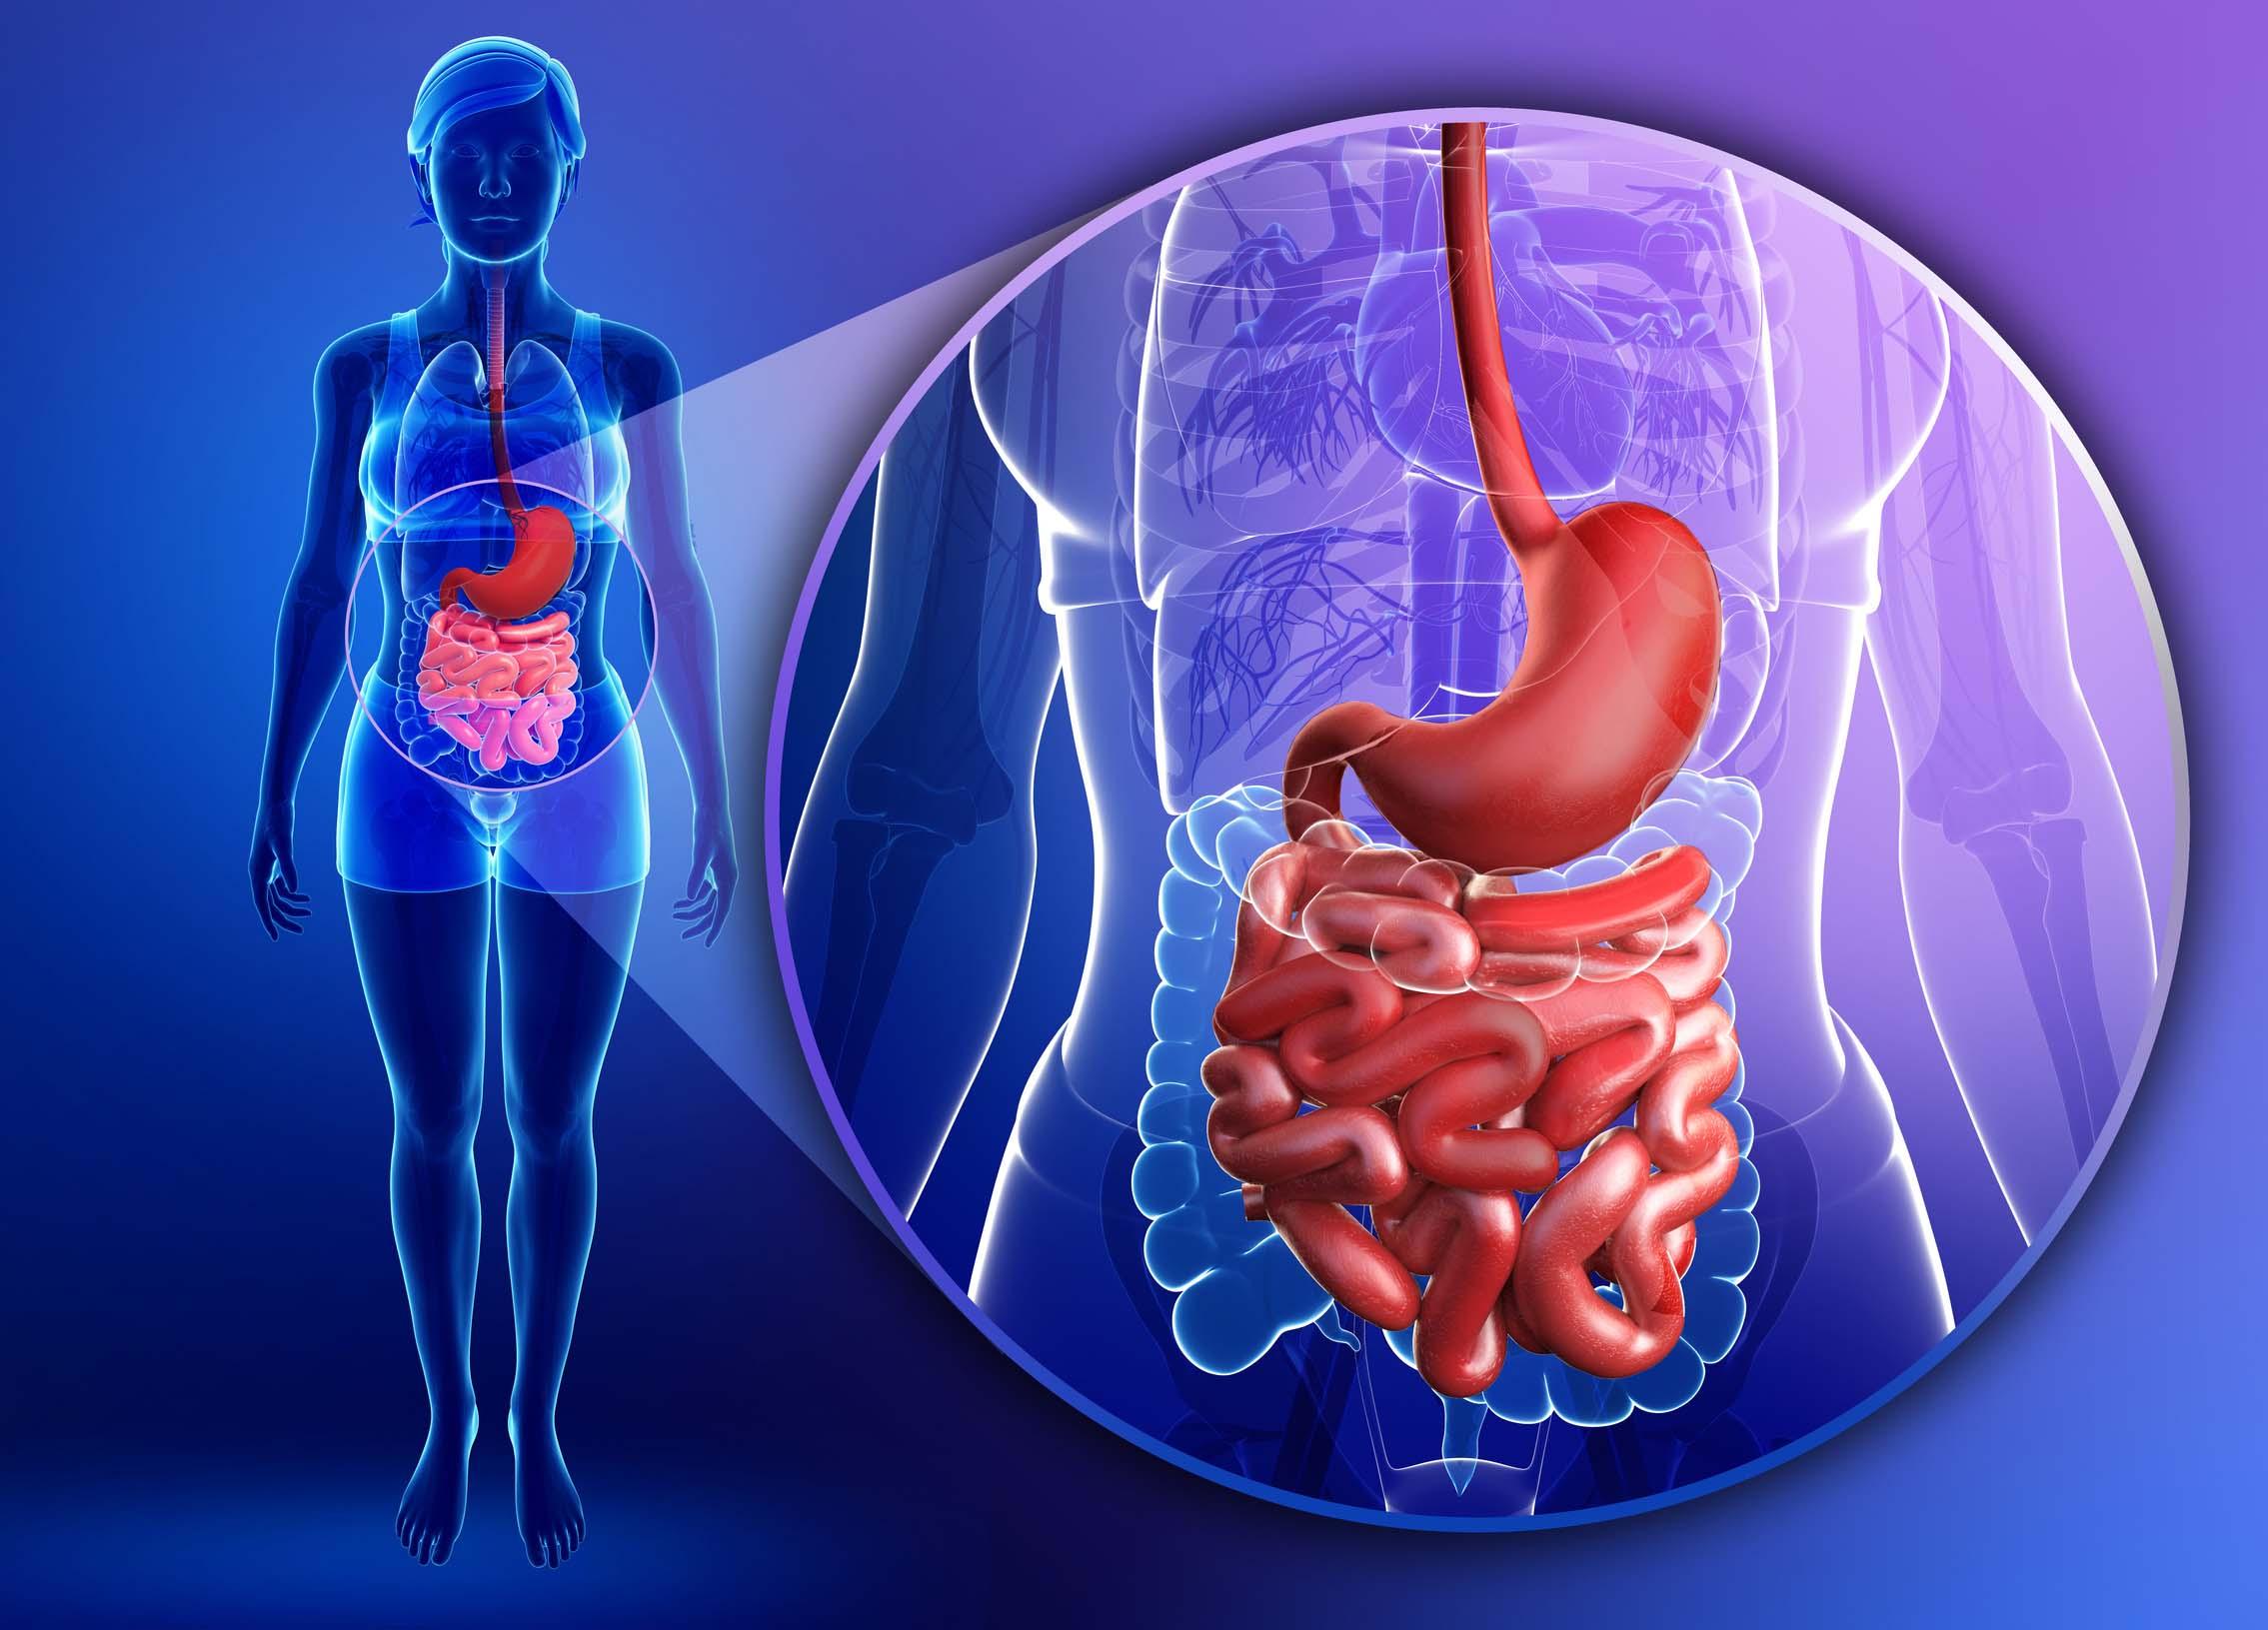 Illustration of female small intestine anatomy